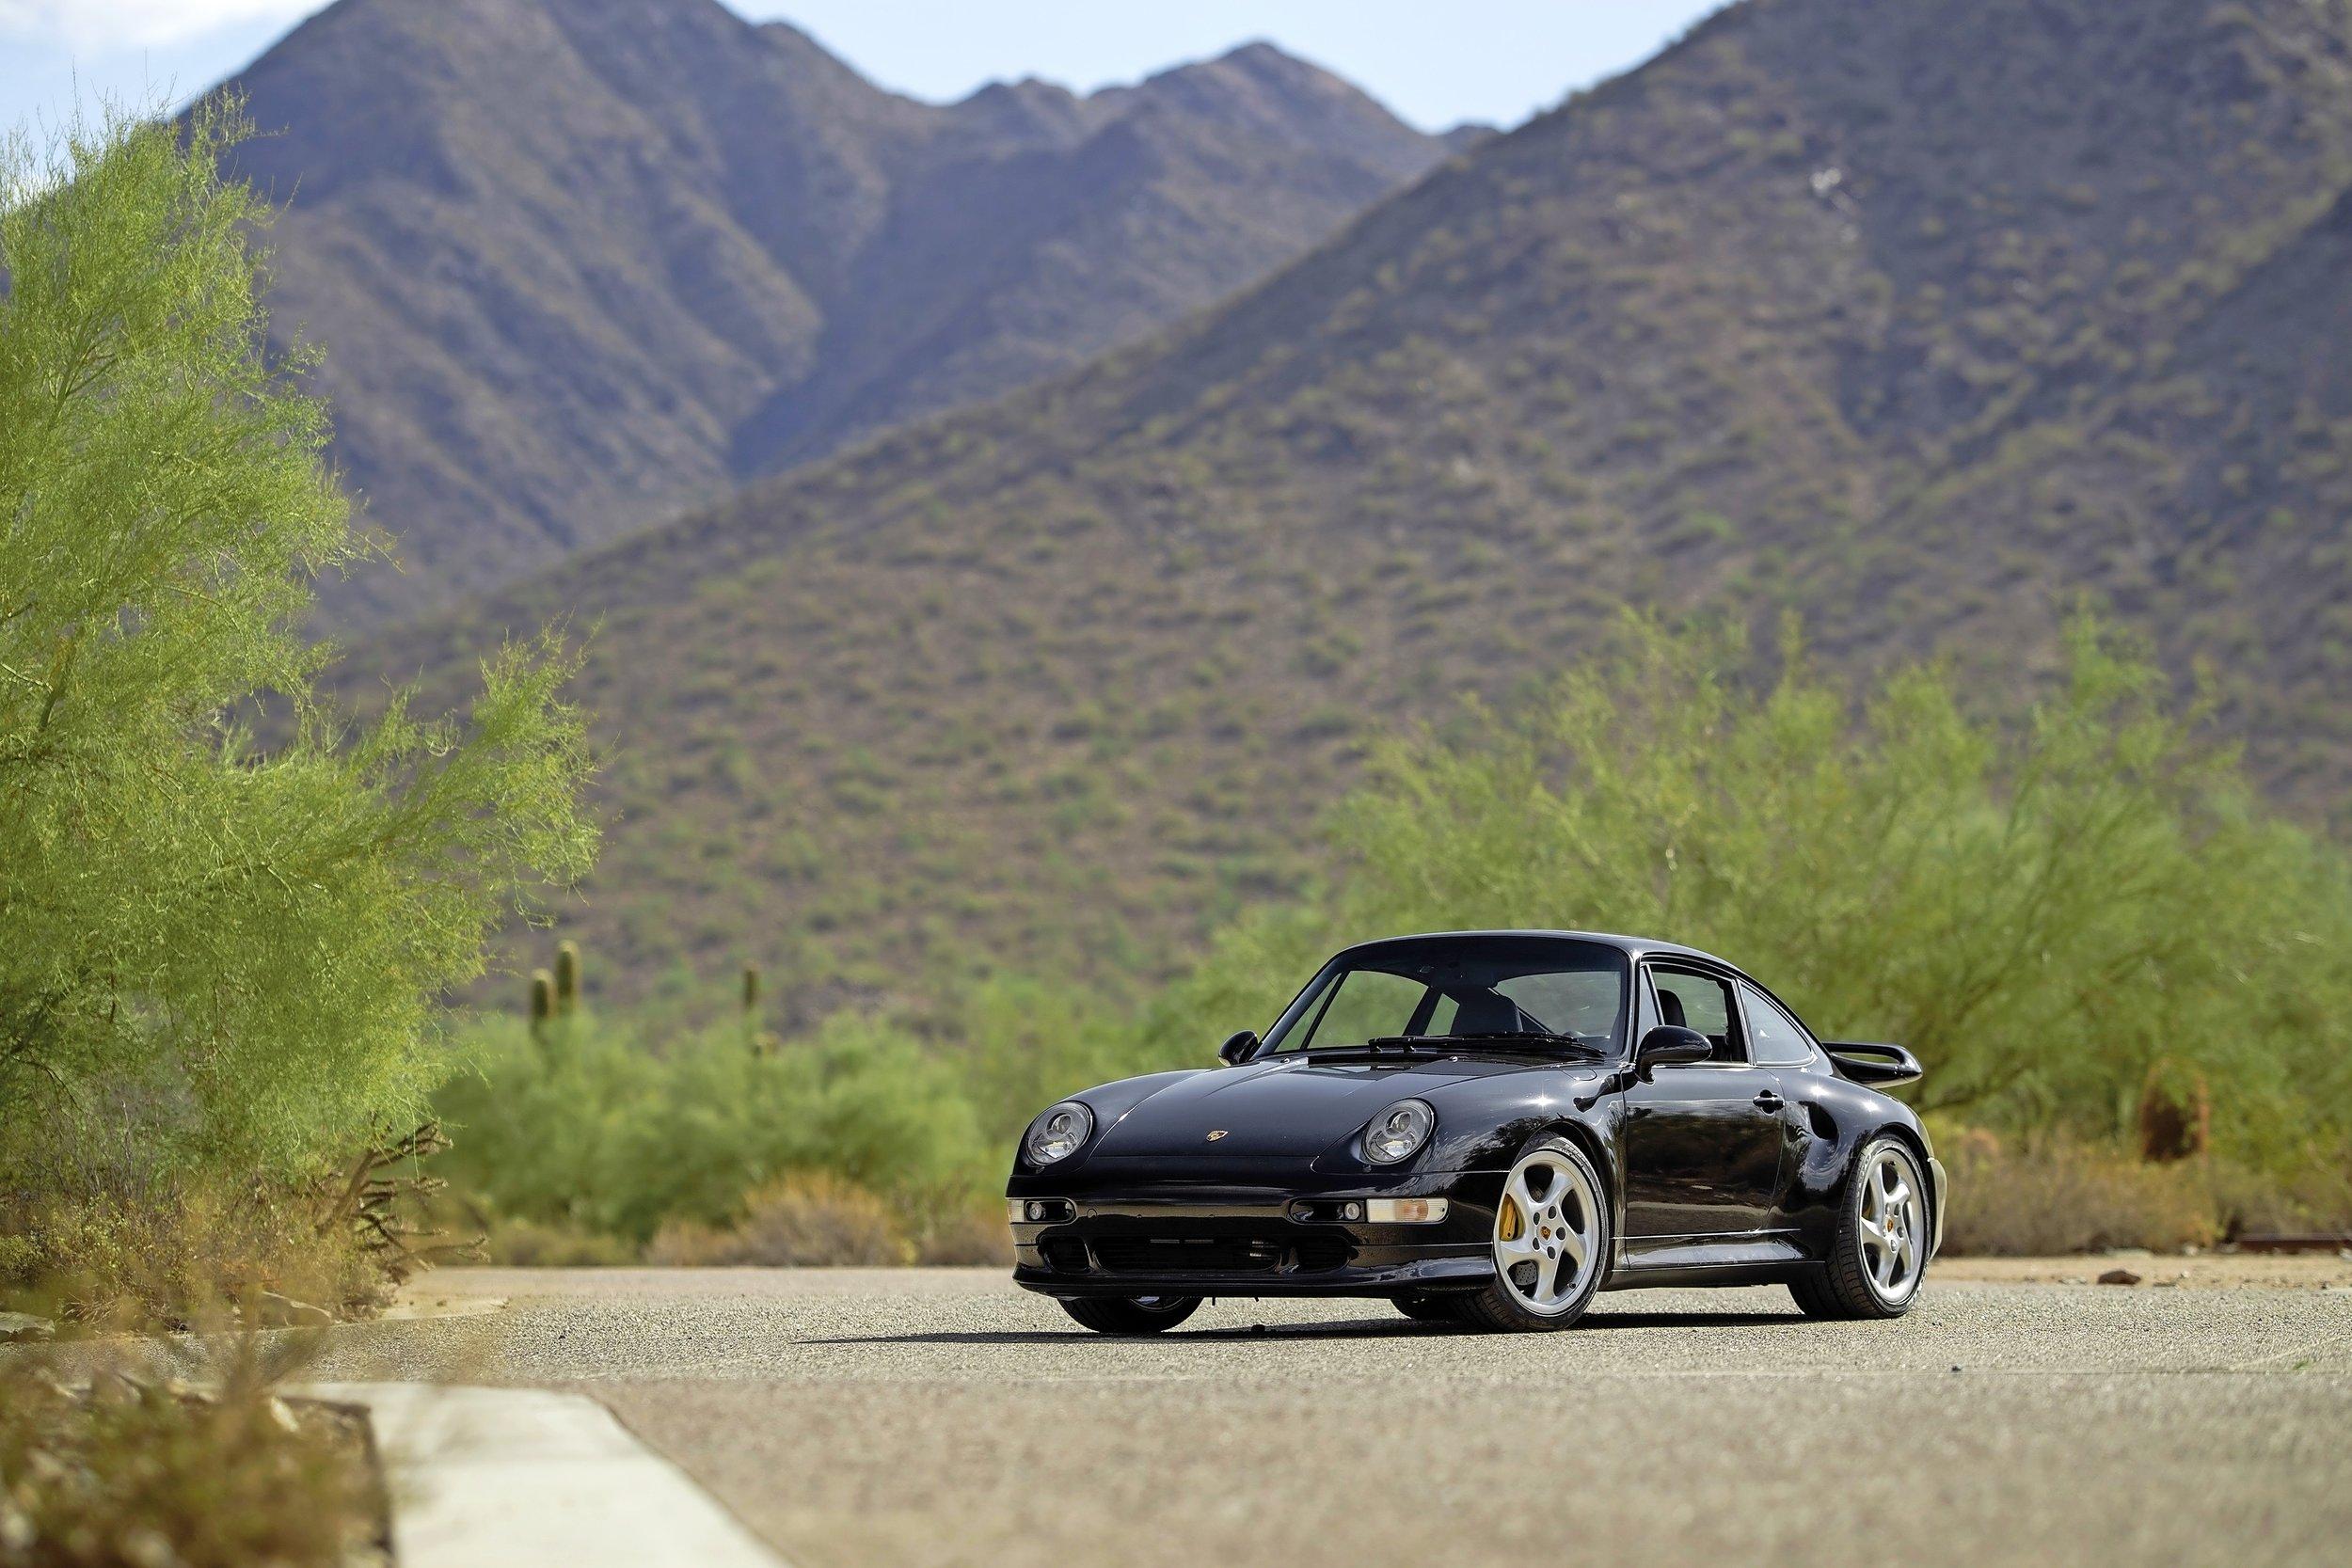 Porsche 993 Turbo S.jpg